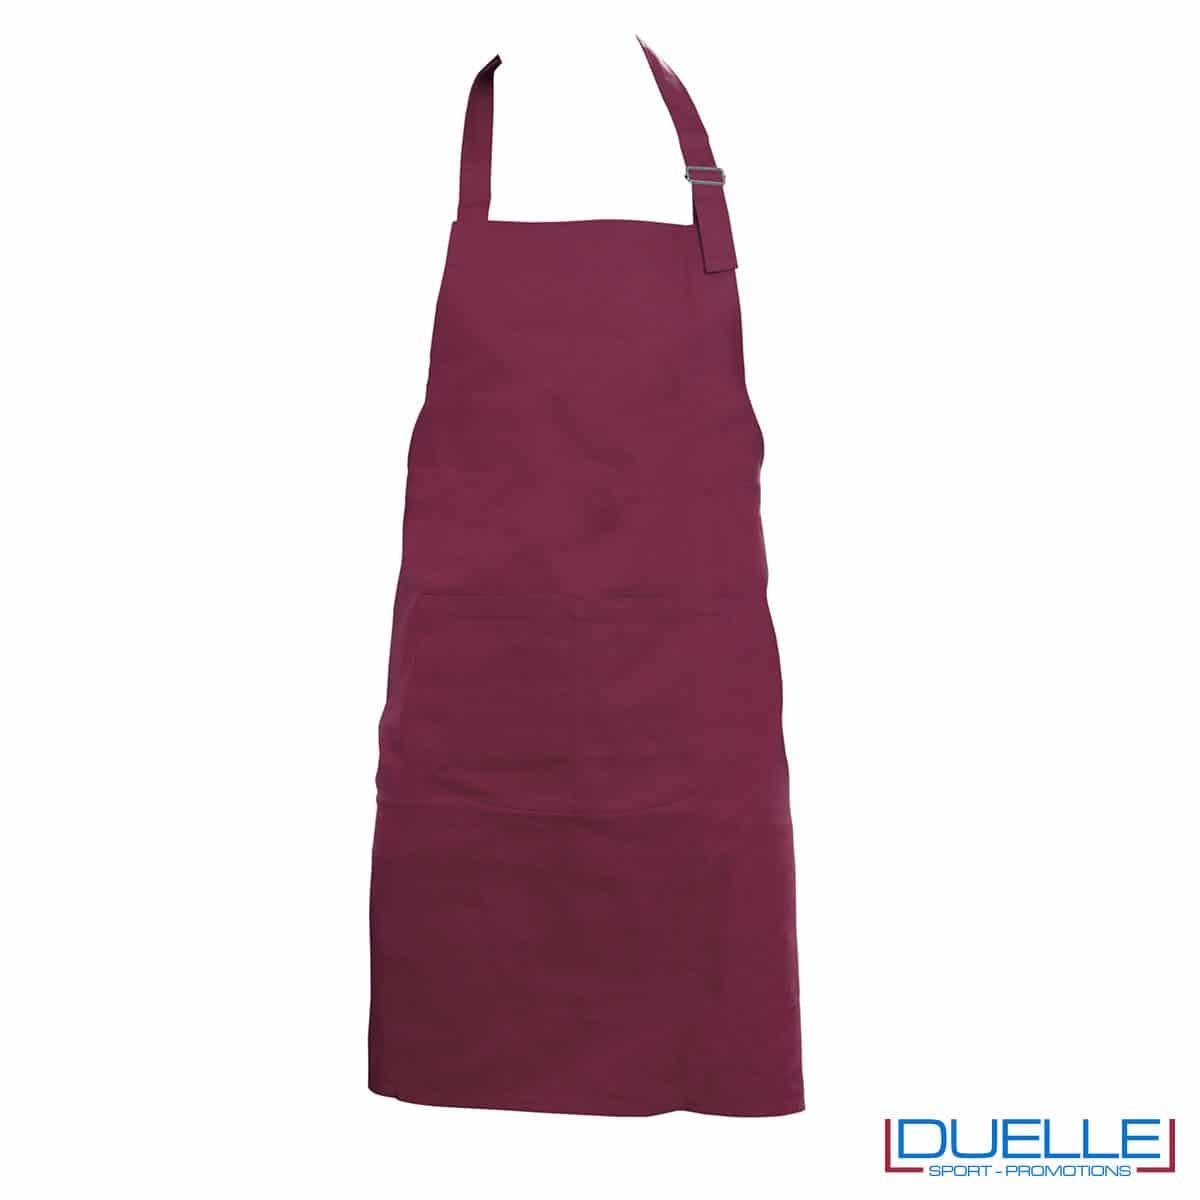 grembiule da cucina bordeaux cotone pesante